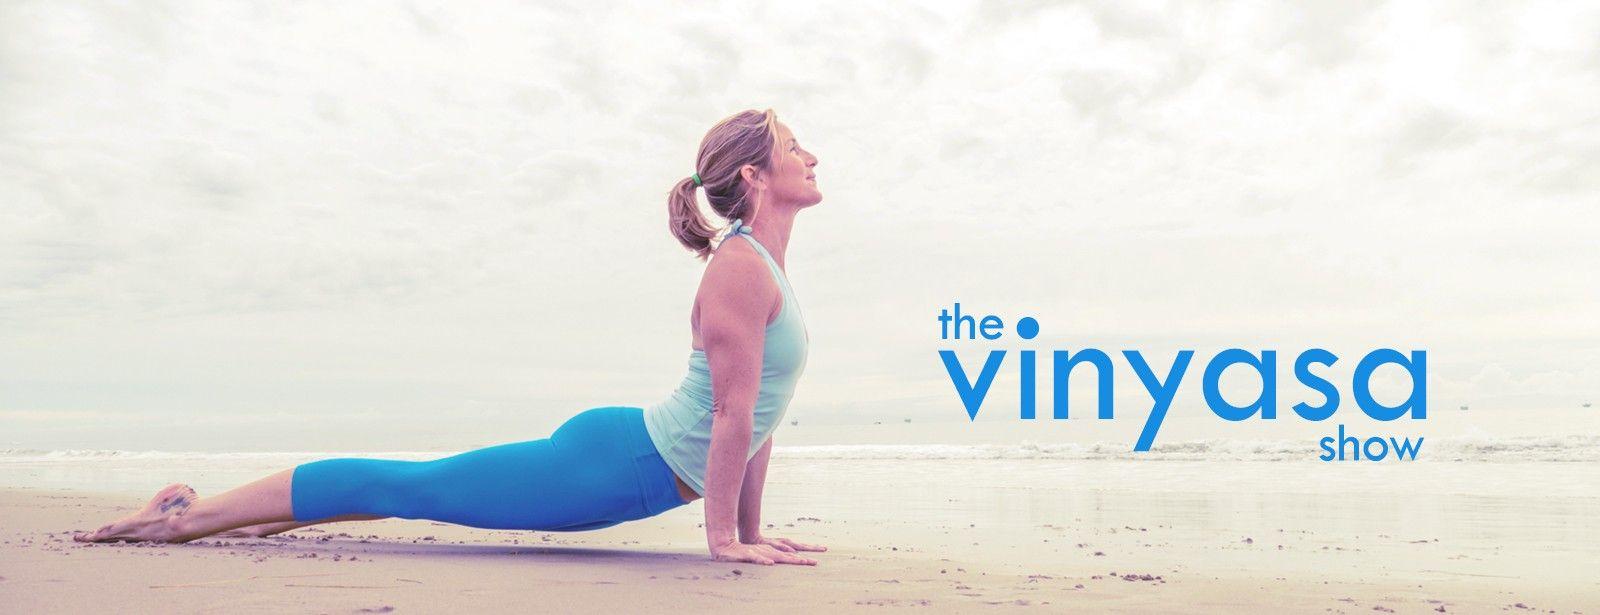 Yoga Anytime | Yoga Show - The Vinyasa Show - $18 per mo